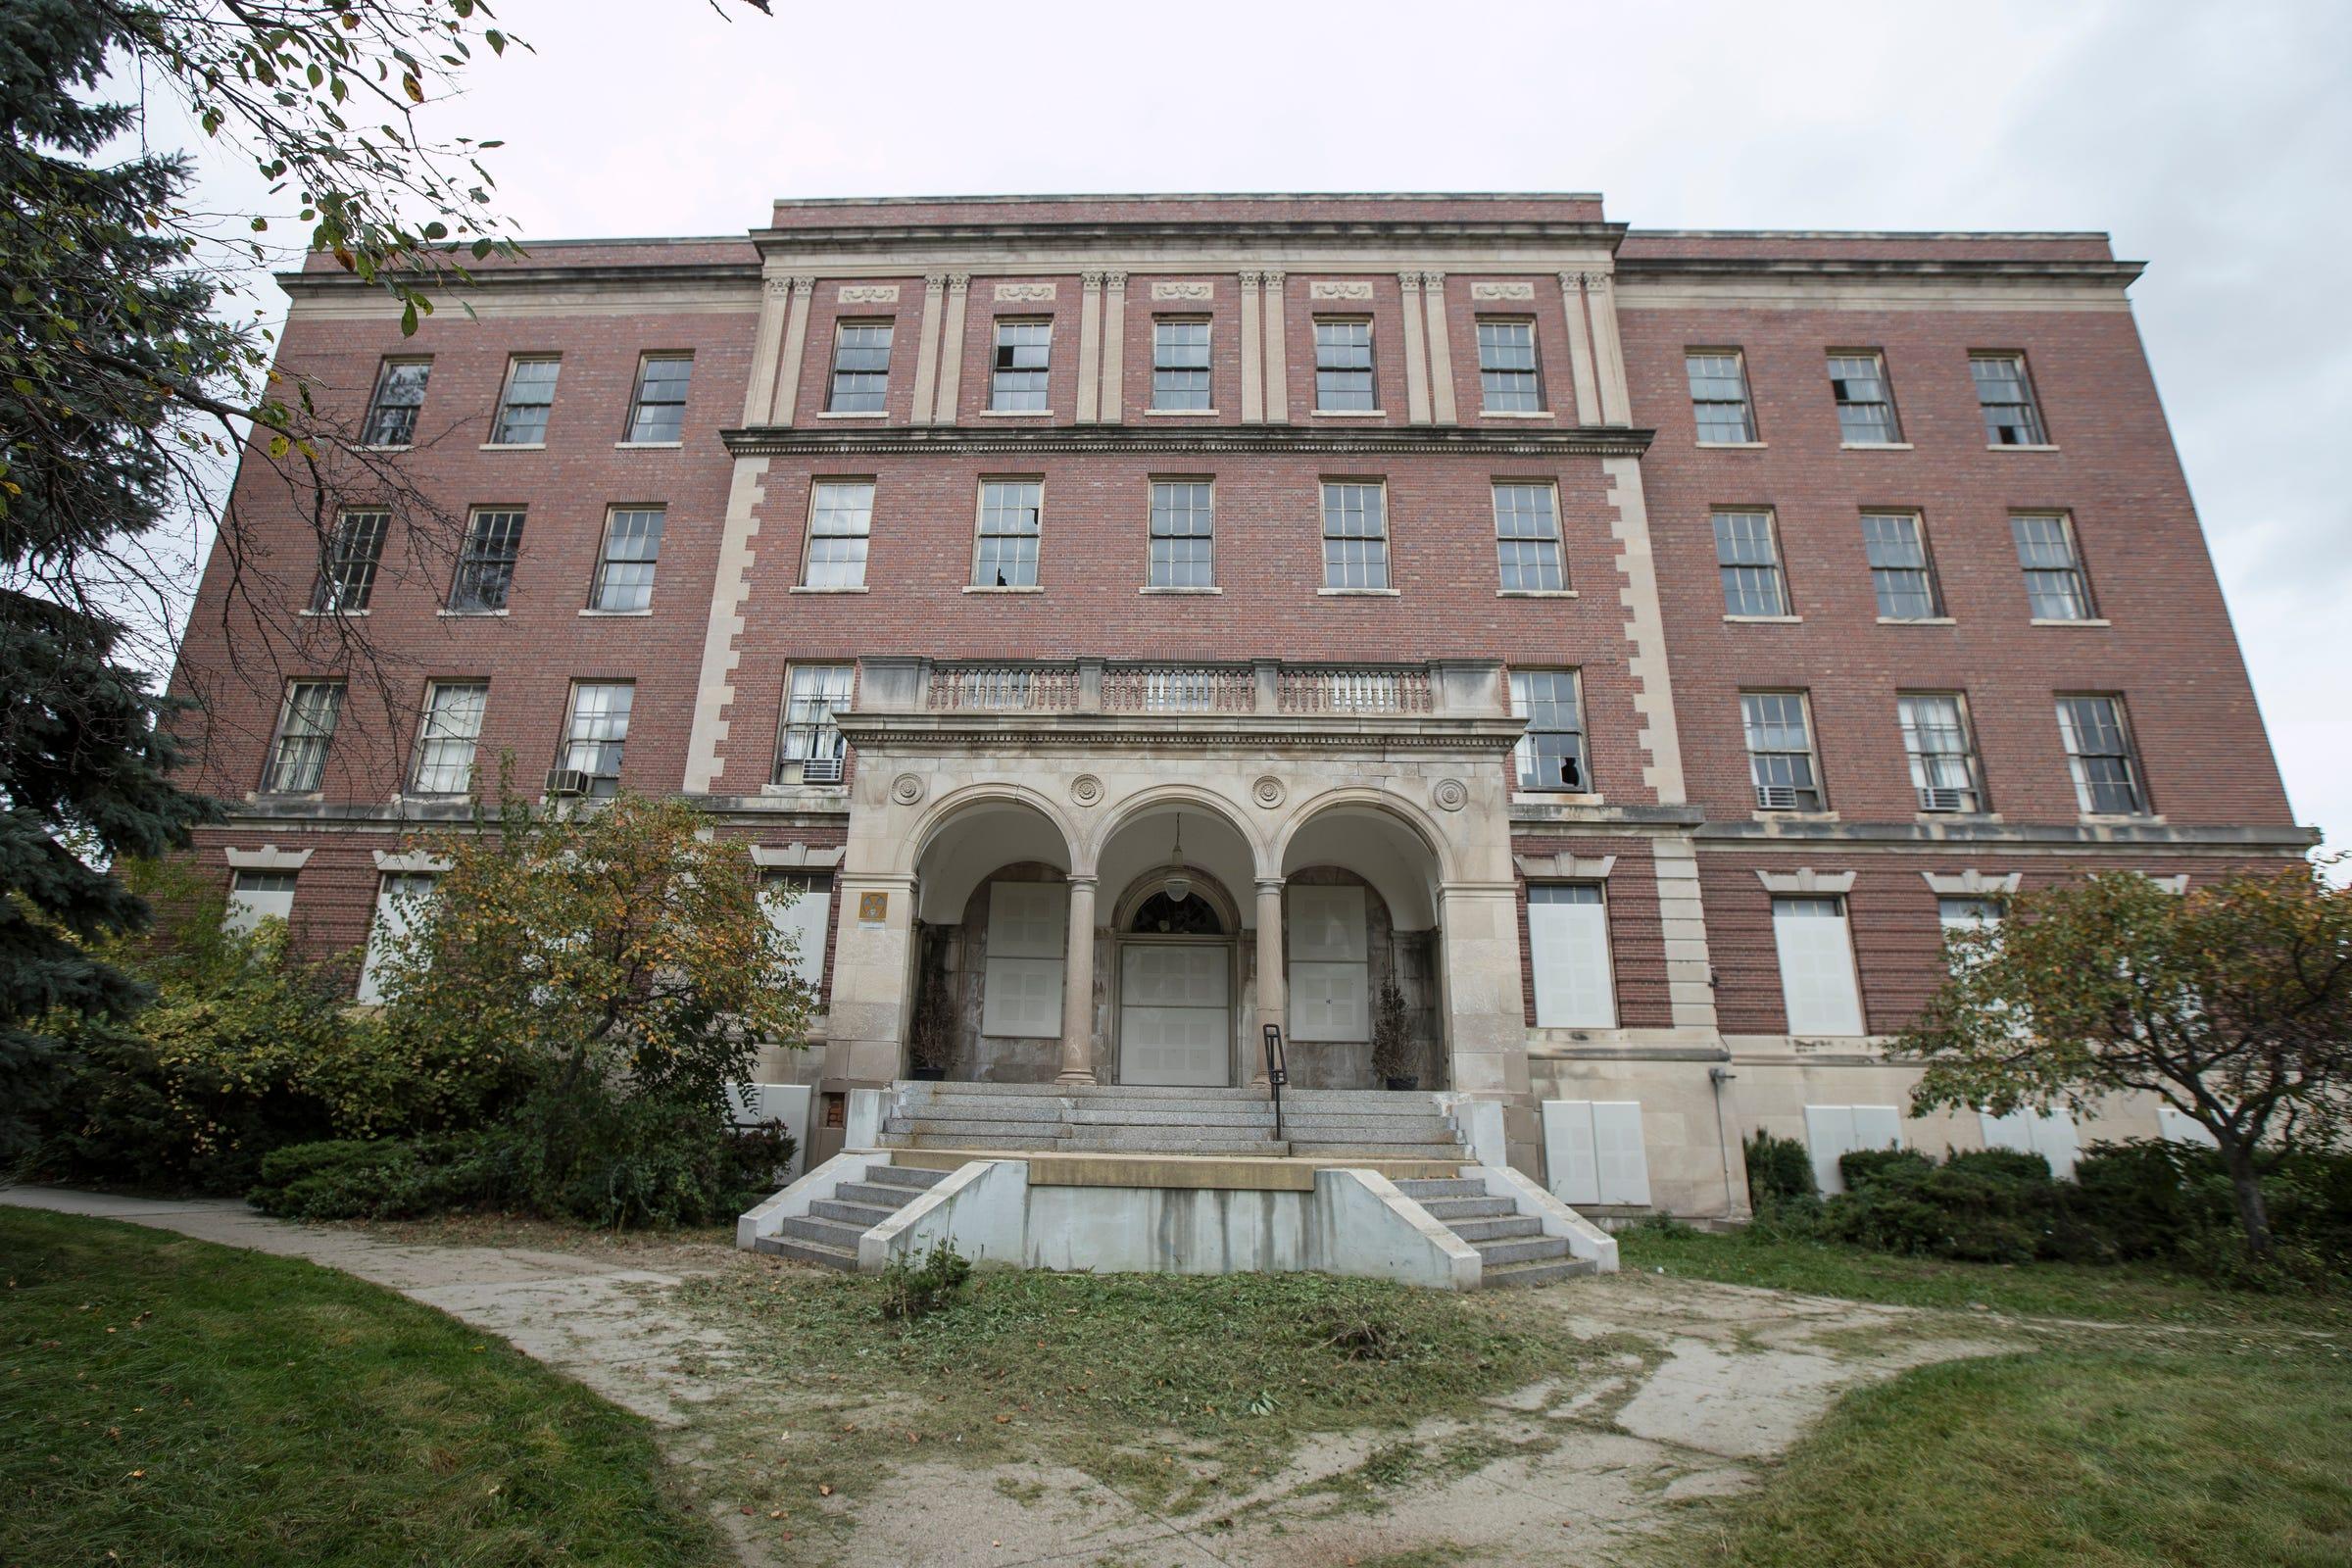 Hush Haunted House in Westland, Michigan